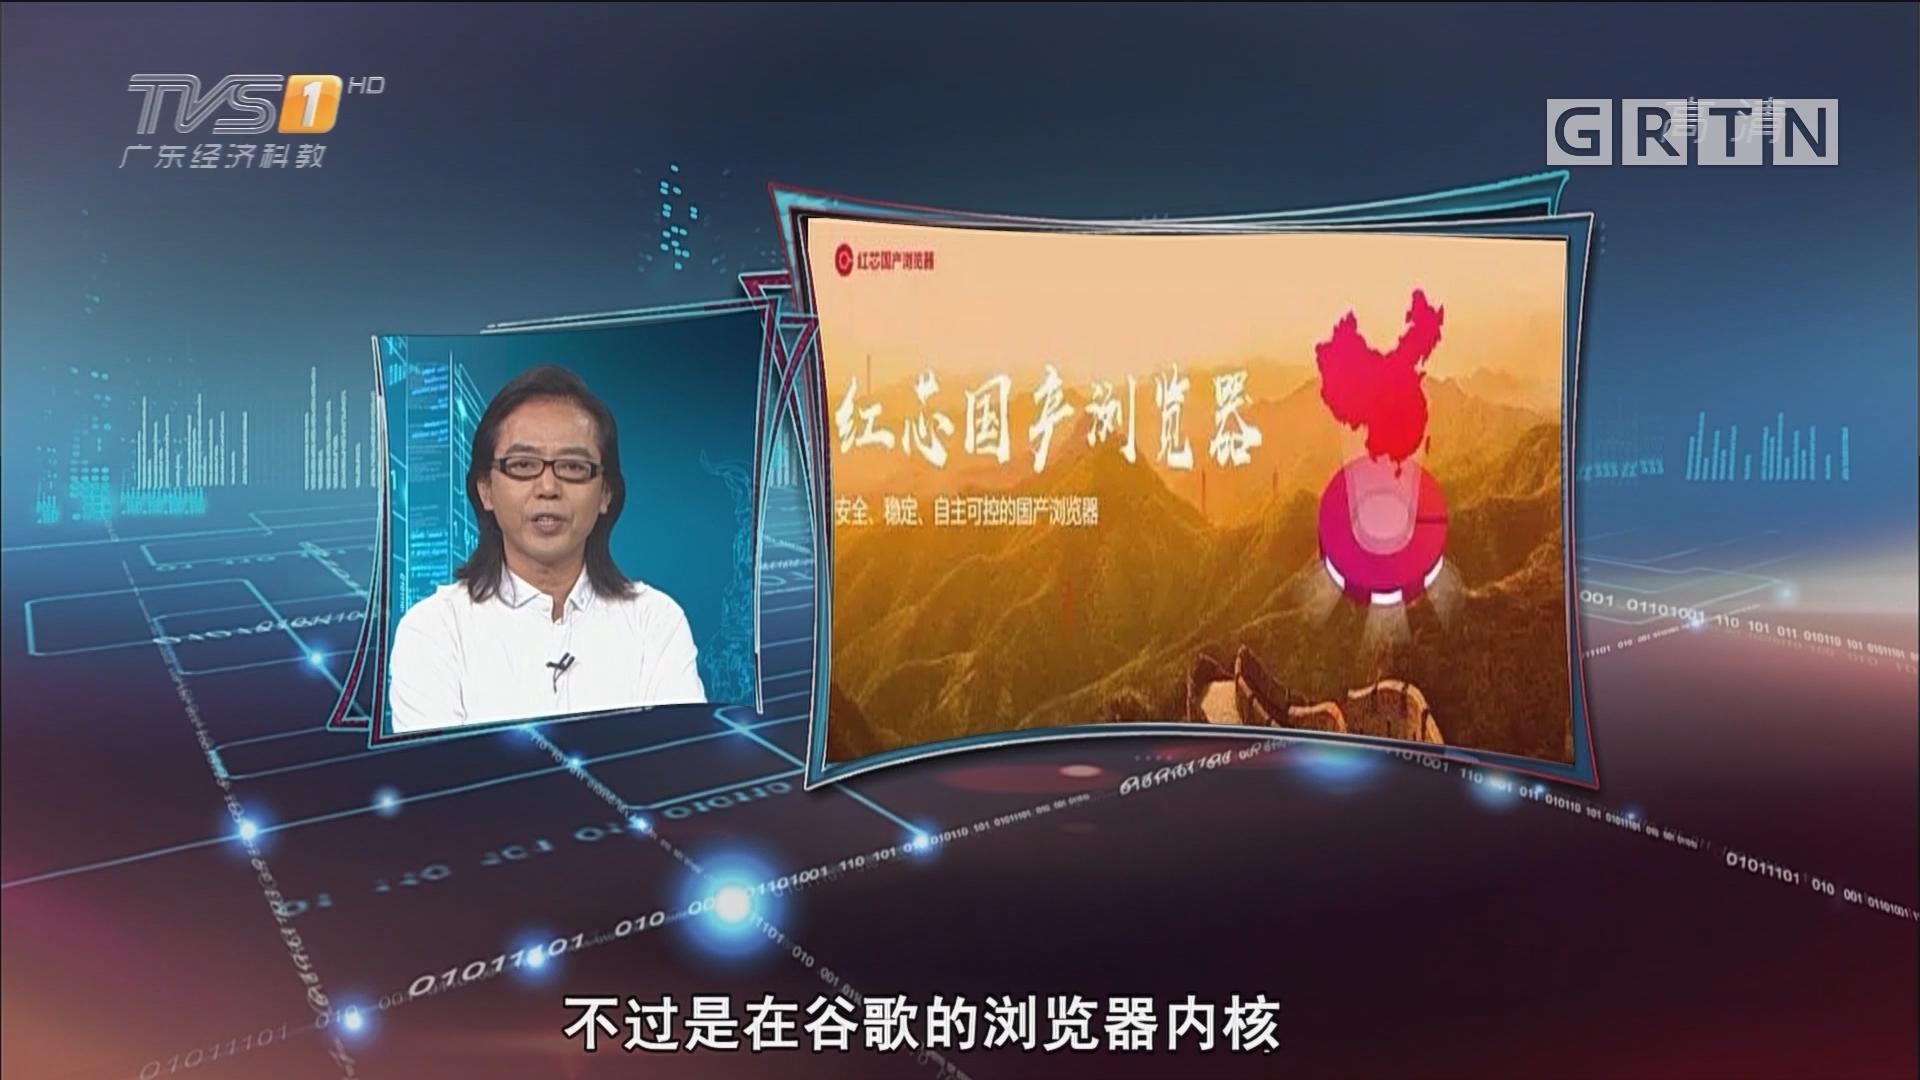 [HD][2018-08-20]马后炮:红芯浏览器事件 不止是夸大宣传这么简单